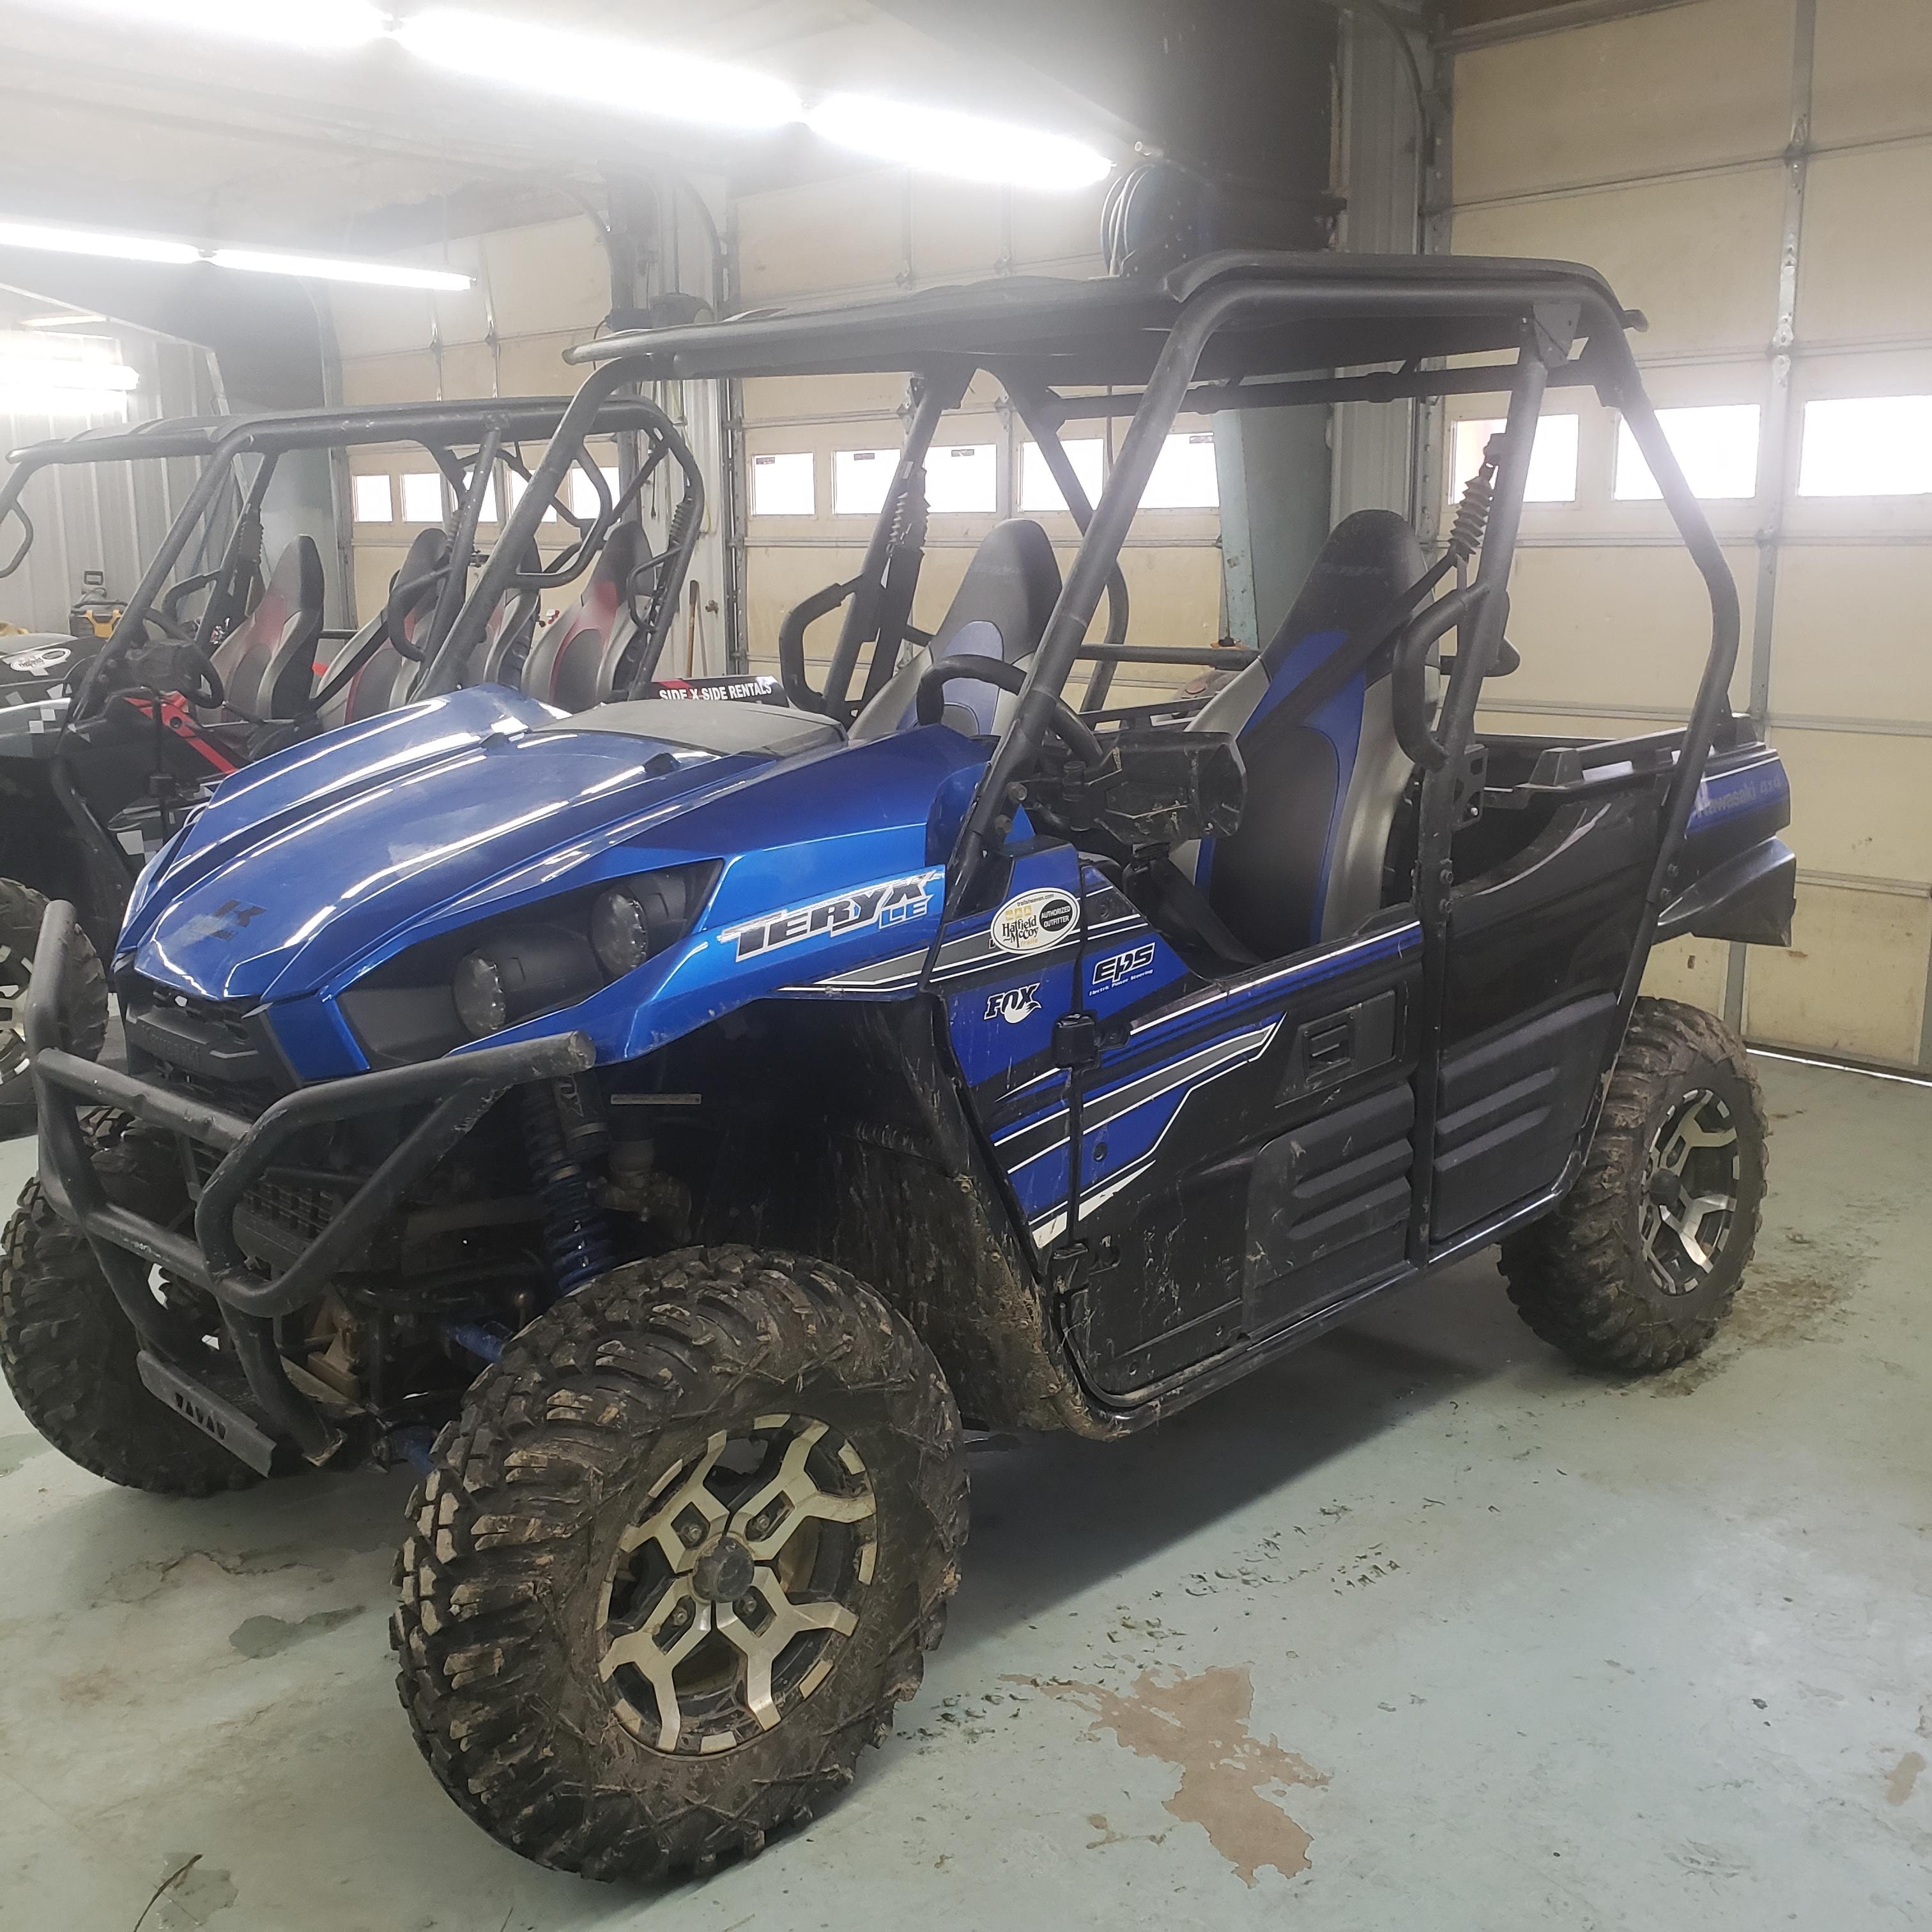 Kawasaki Teryx 800 2 seater